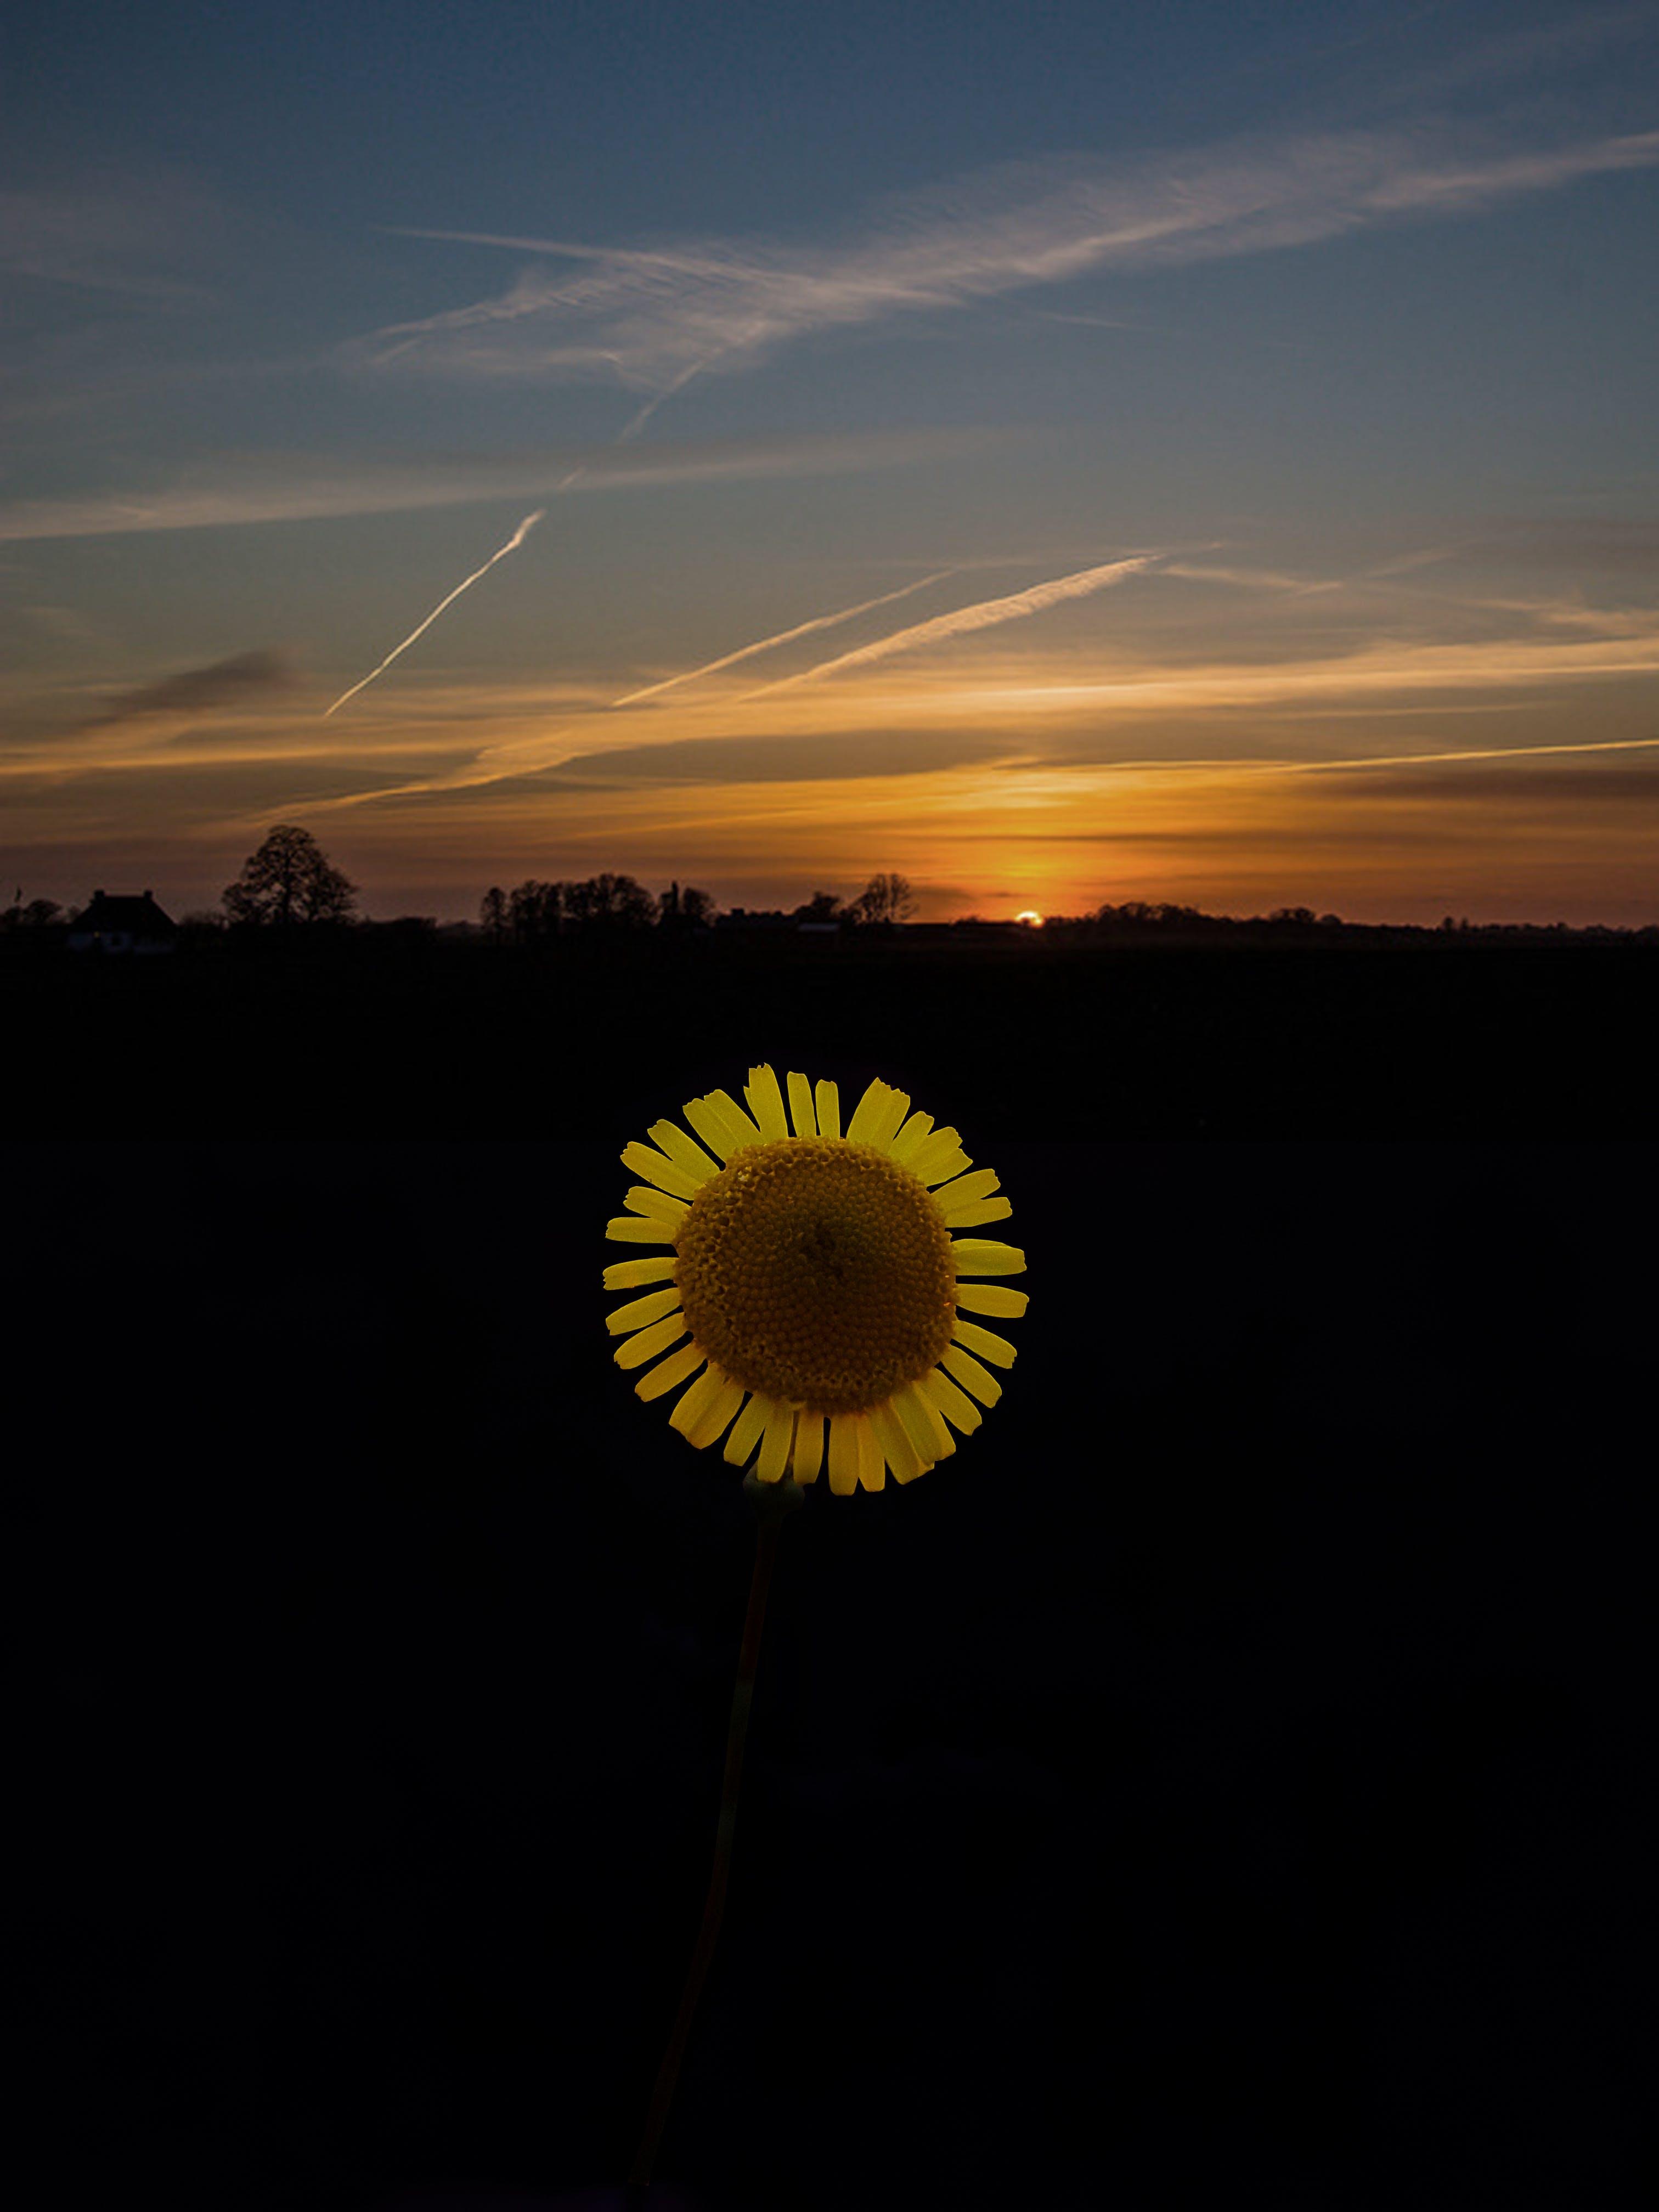 Free stock photo of Adobe Photoshop, beautiful flowers, dark, dawn